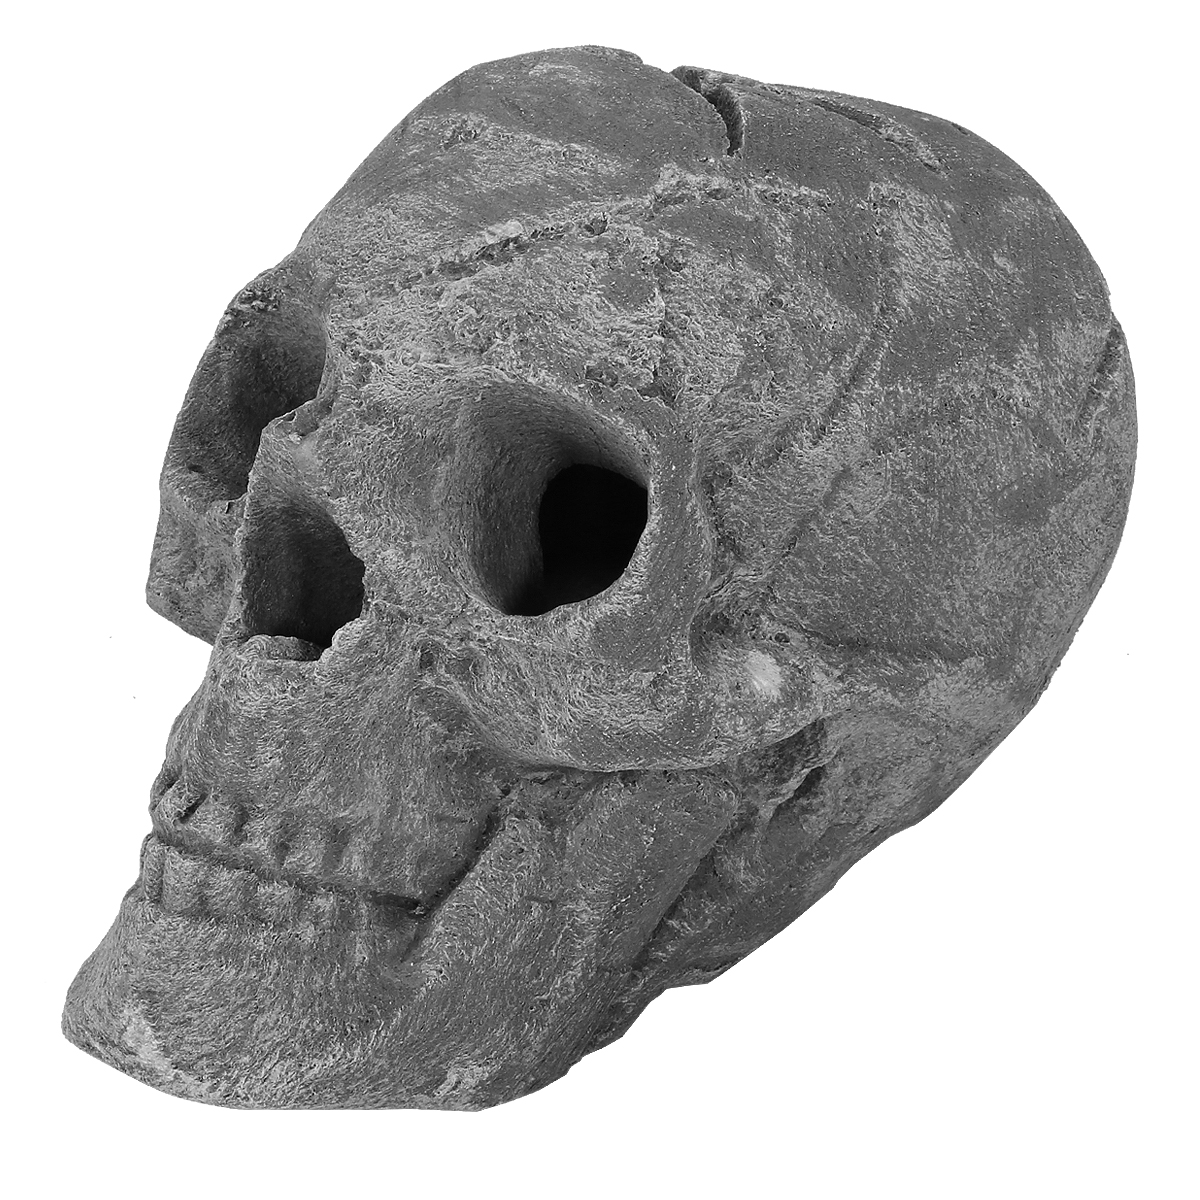 Barton Ceramic Skull Fire Pits And Fireplaces Single Fireproof Ceramic Skull Grey Walmart Com Walmart Com